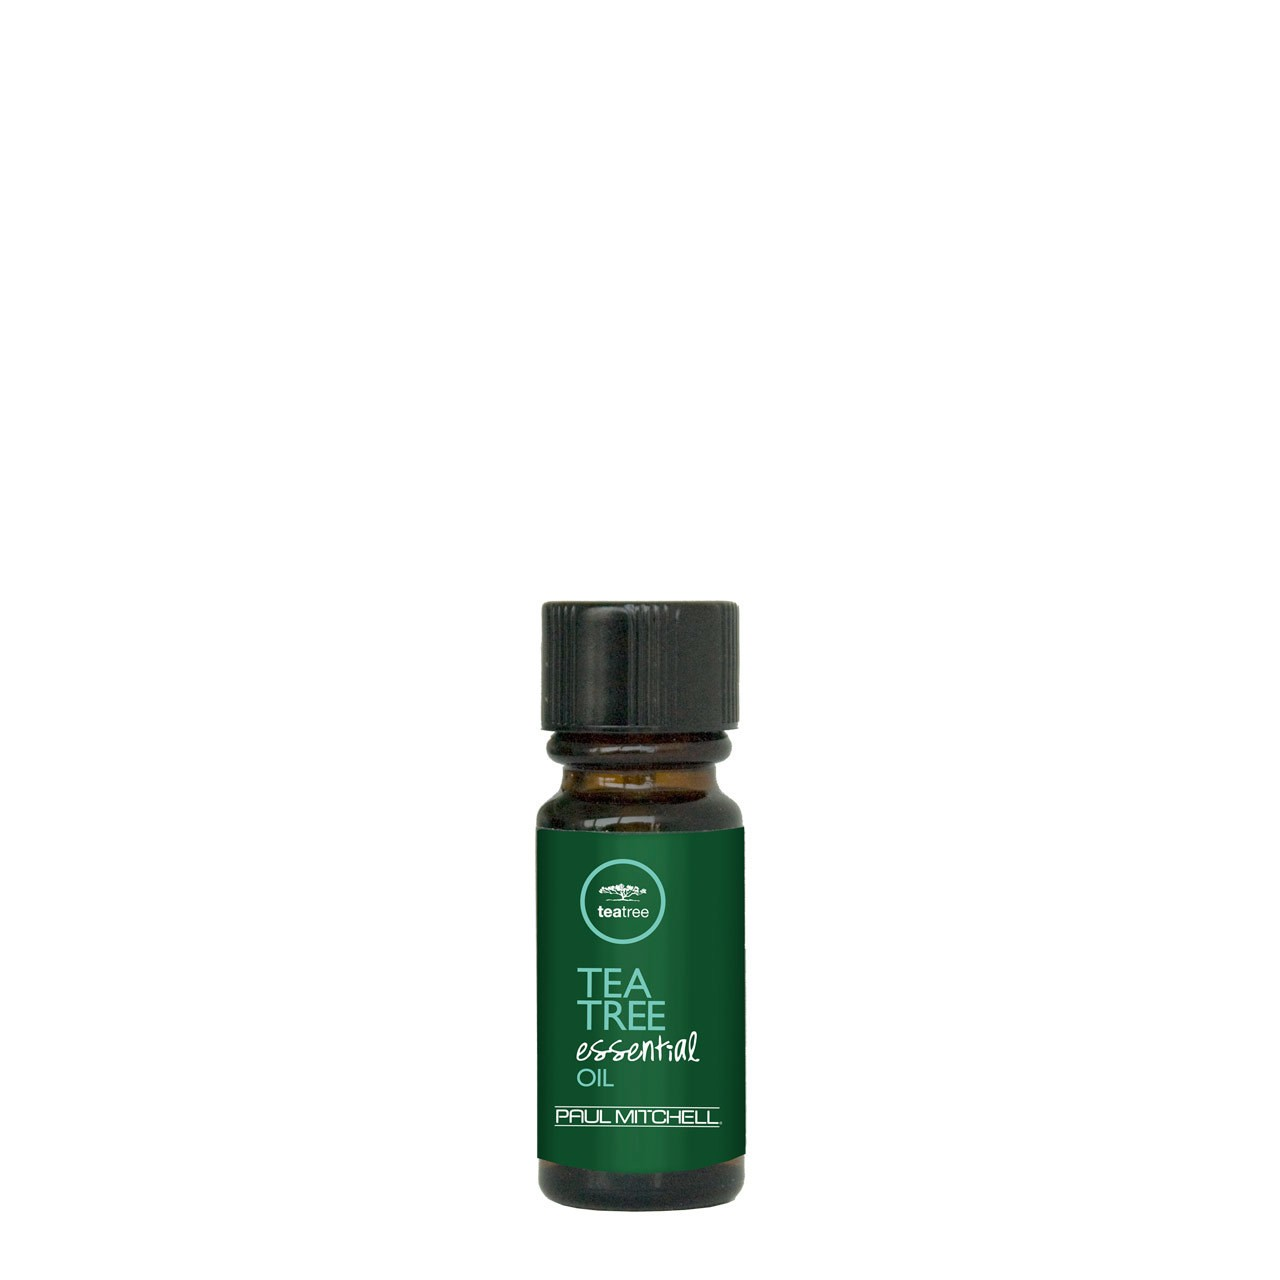 Paul Mitchell Tea Tree Oil 10ml